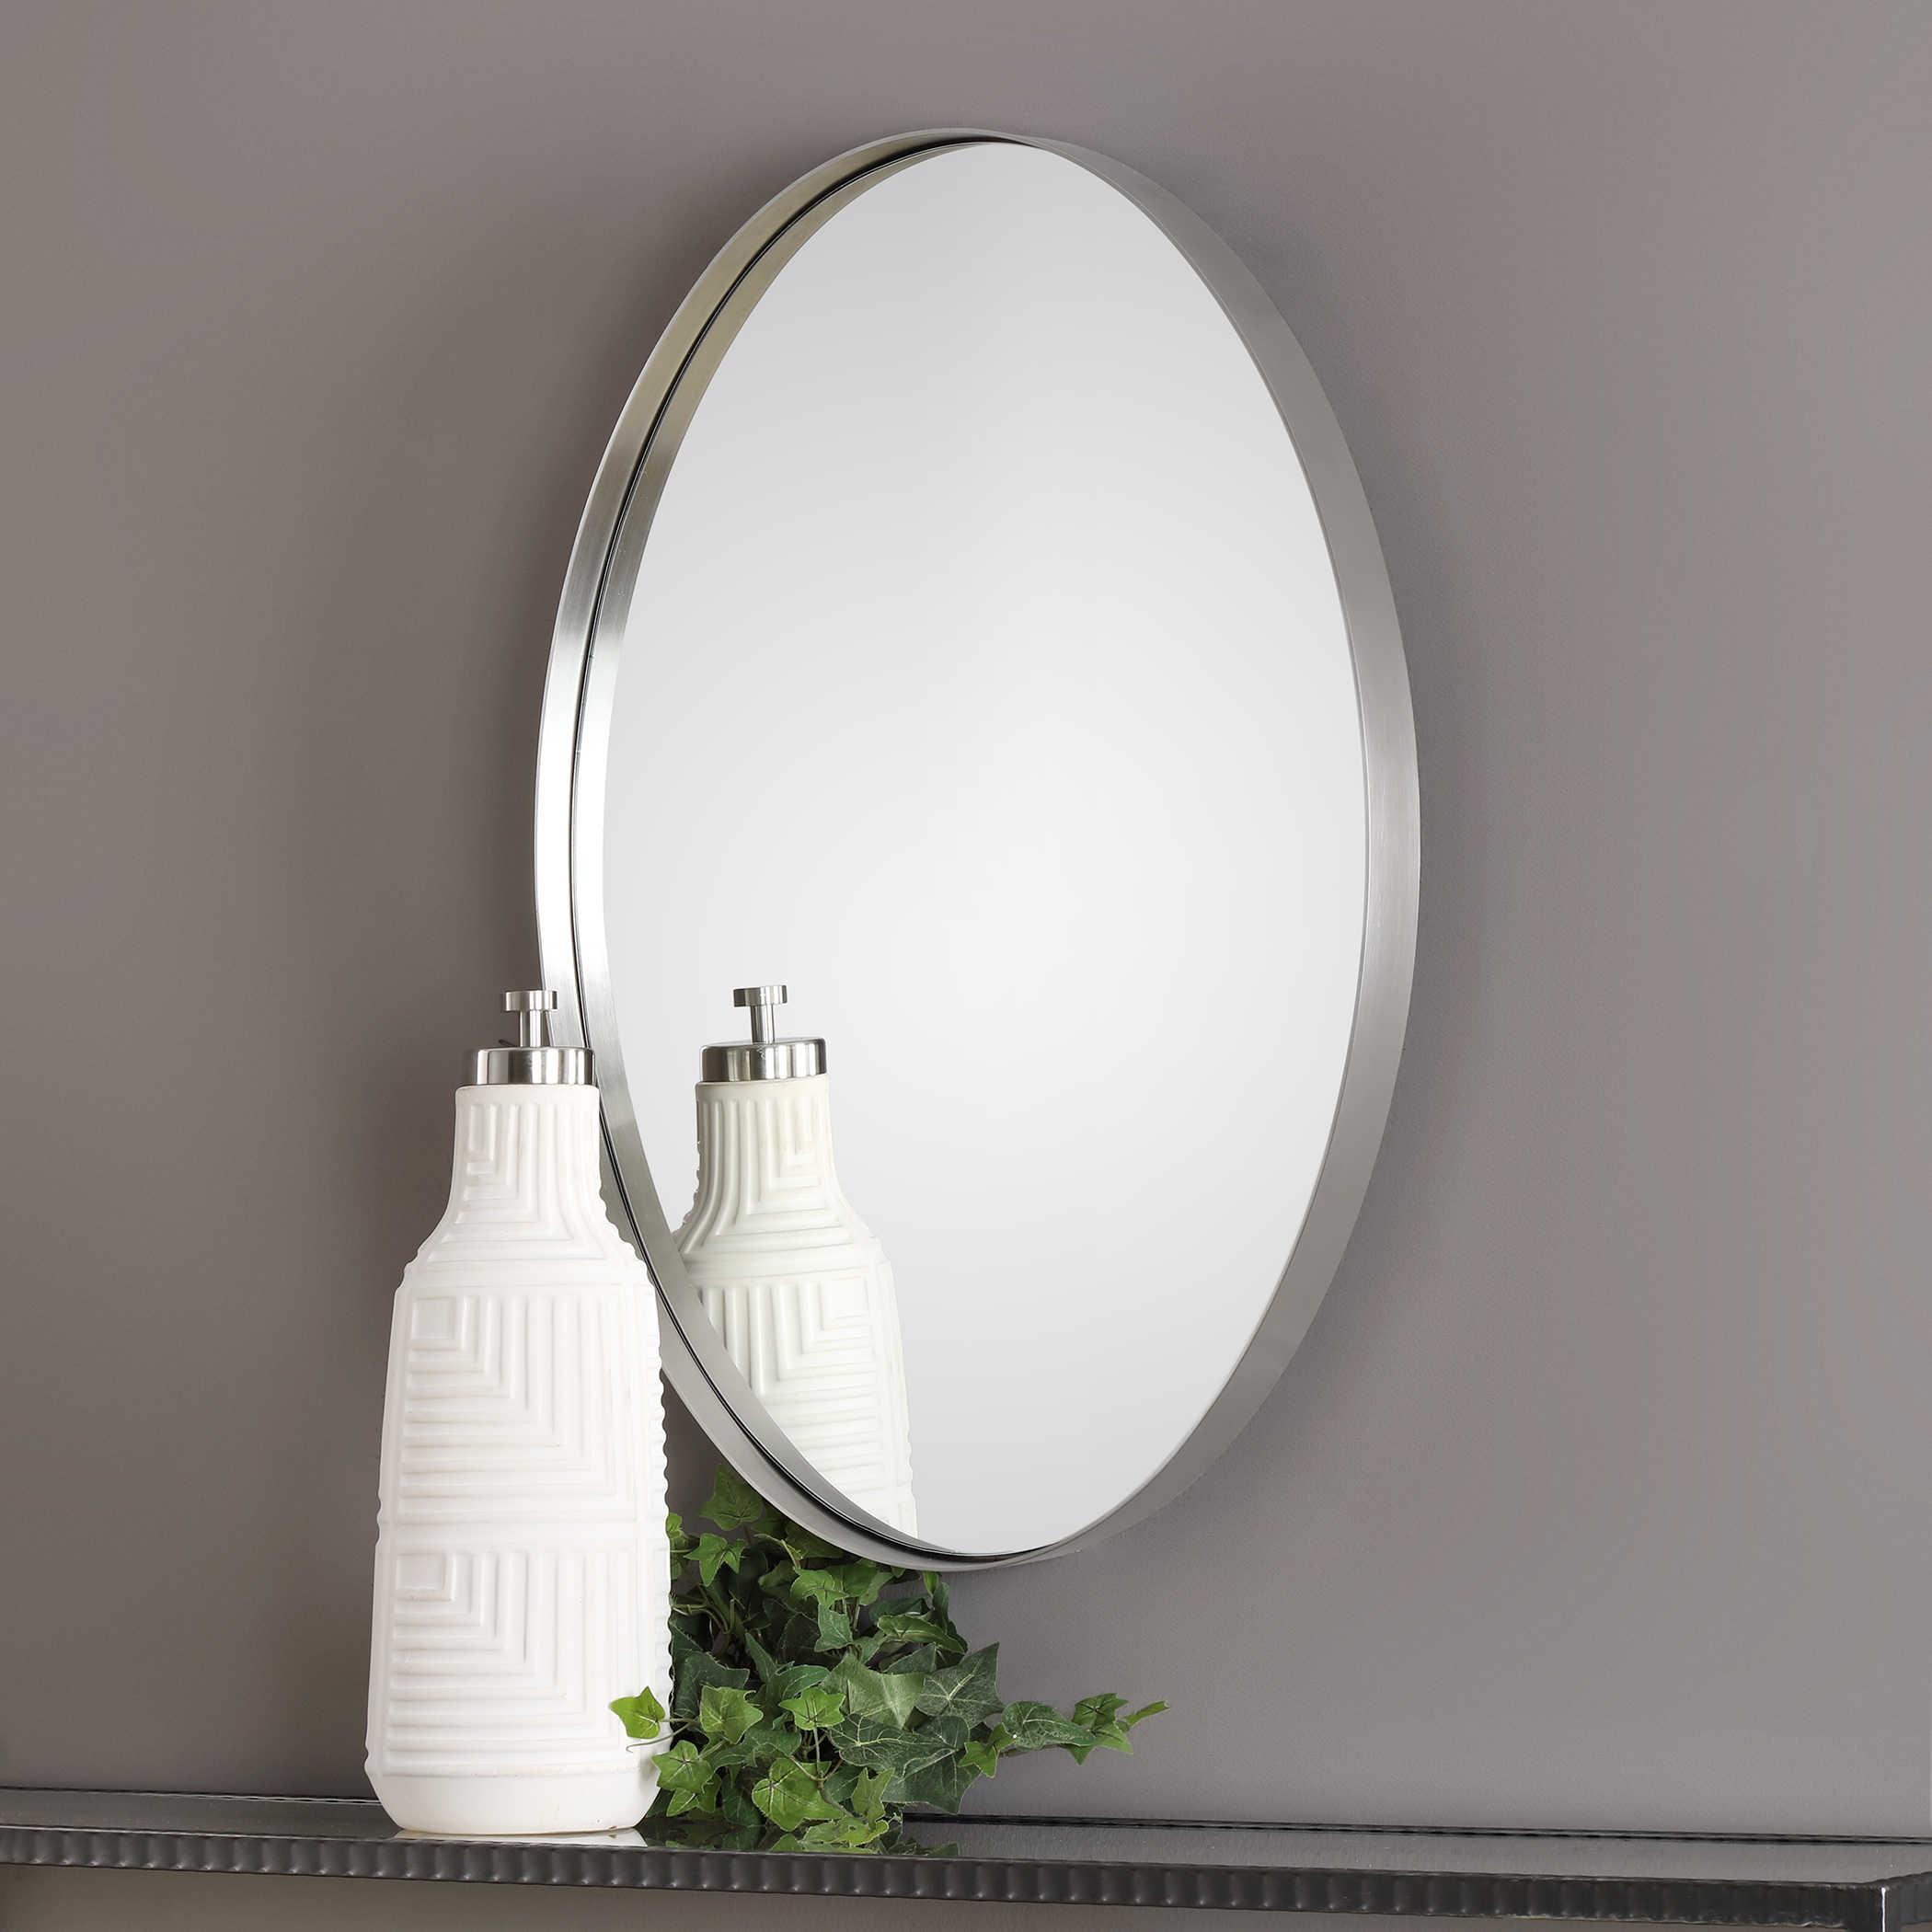 Pursley Brushed Nickel Oval Mirror Uttermost